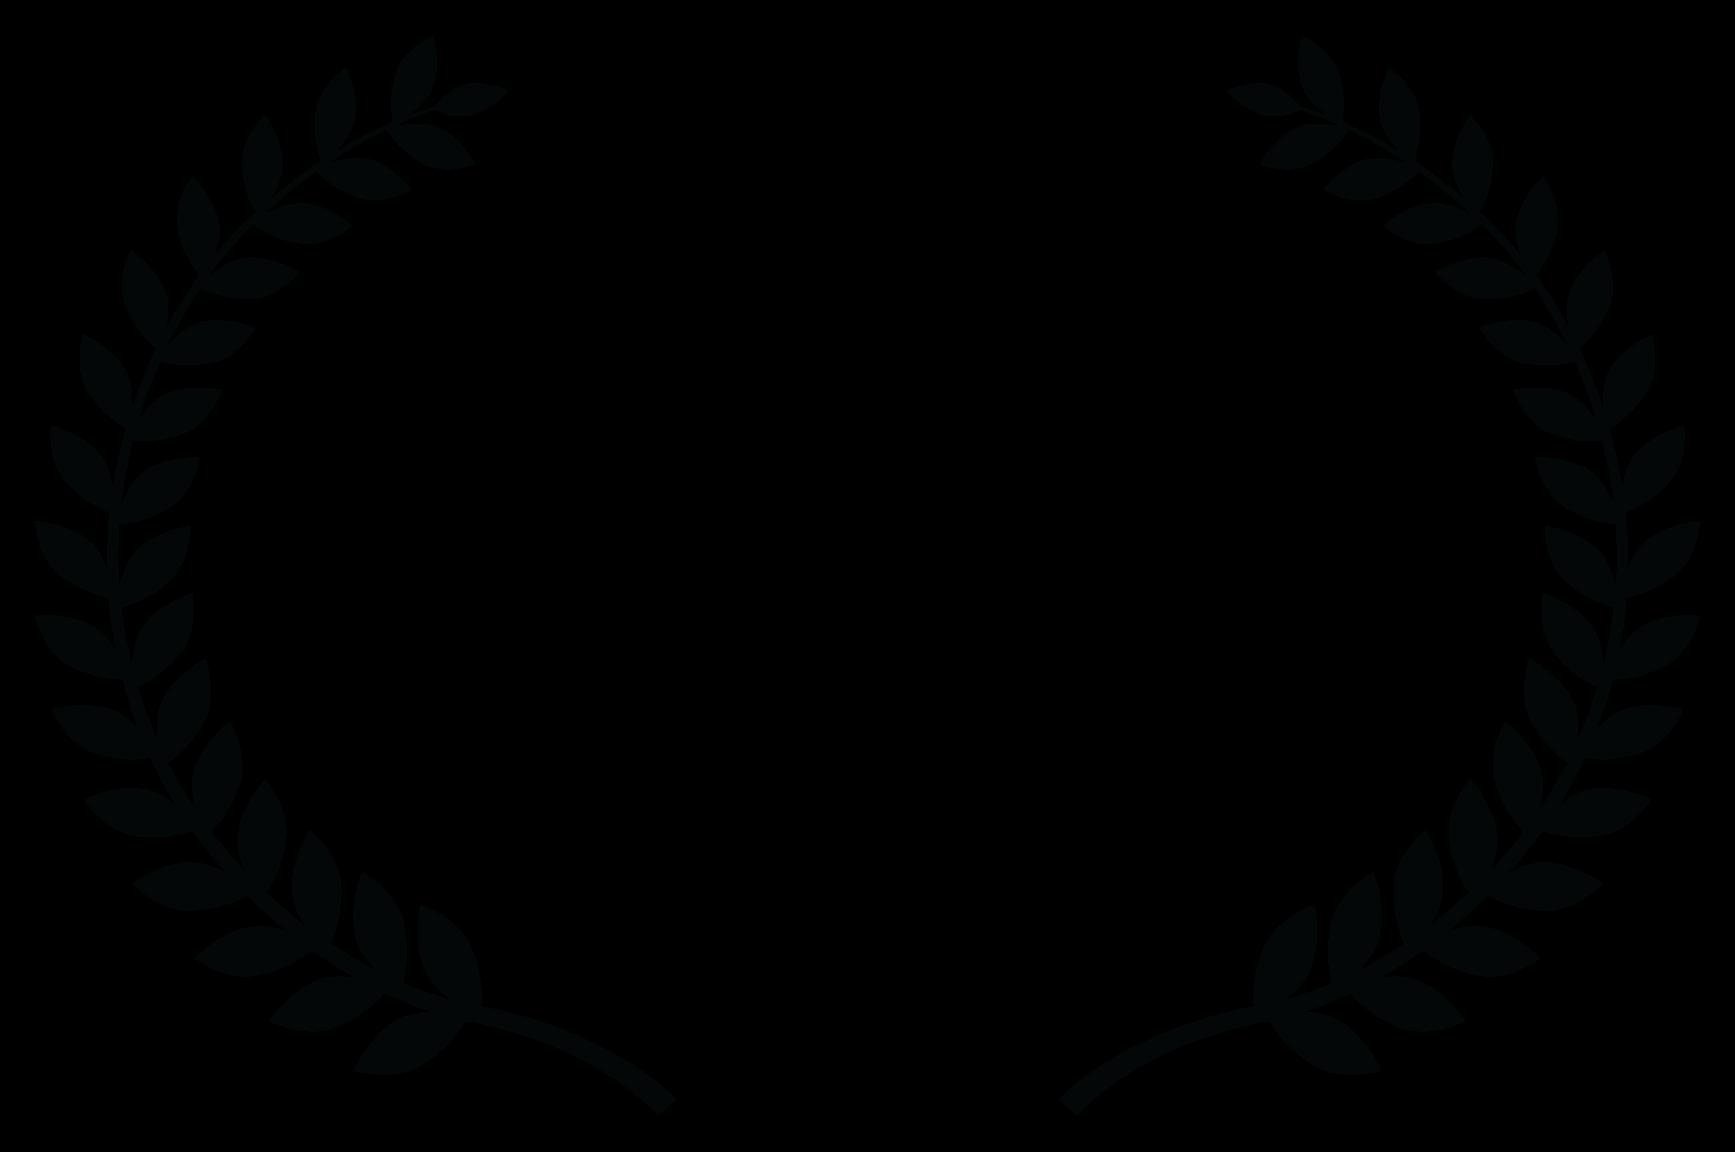 OFFICIAL SELECTION - Barcelona Planet Film Festival - 2017